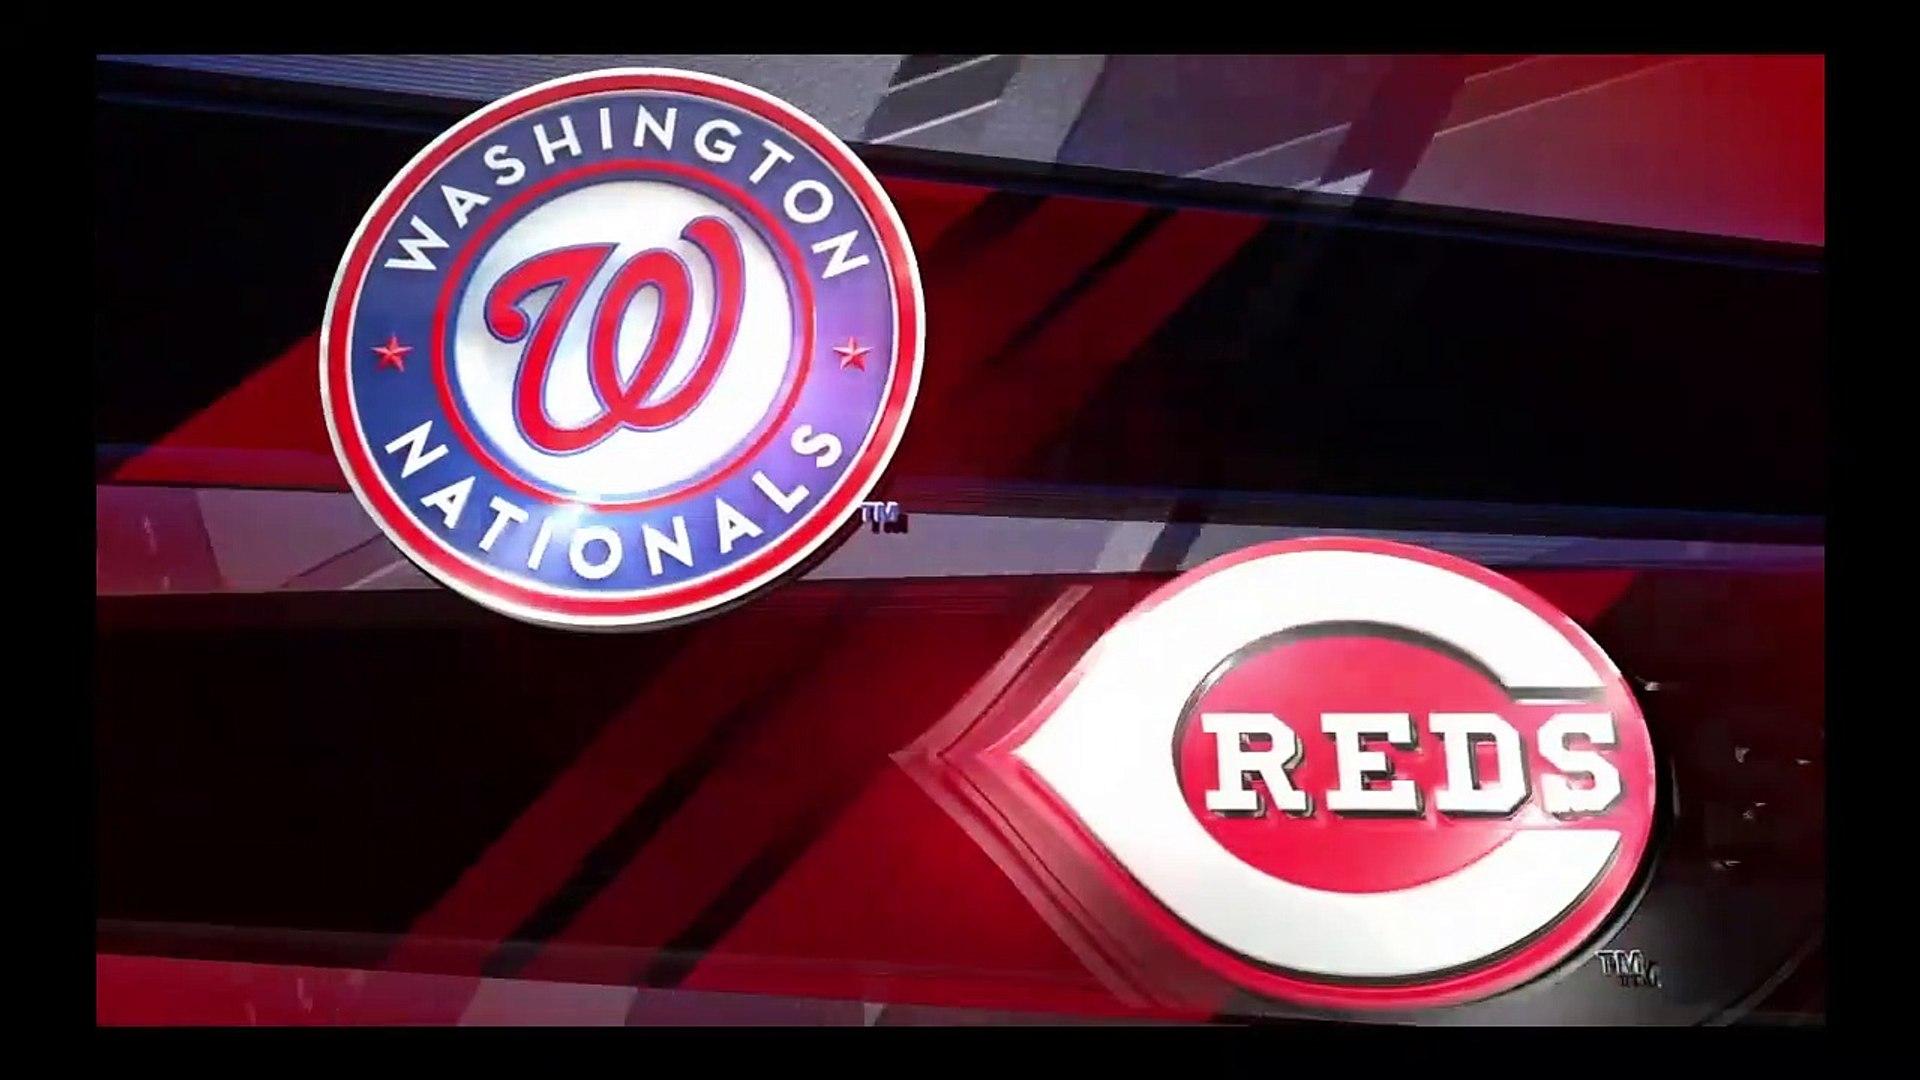 MLB Baseball - Washington Nationals @ Cincinnati Reds - MLB The Show 19 Simulation Full Game 2/6/19